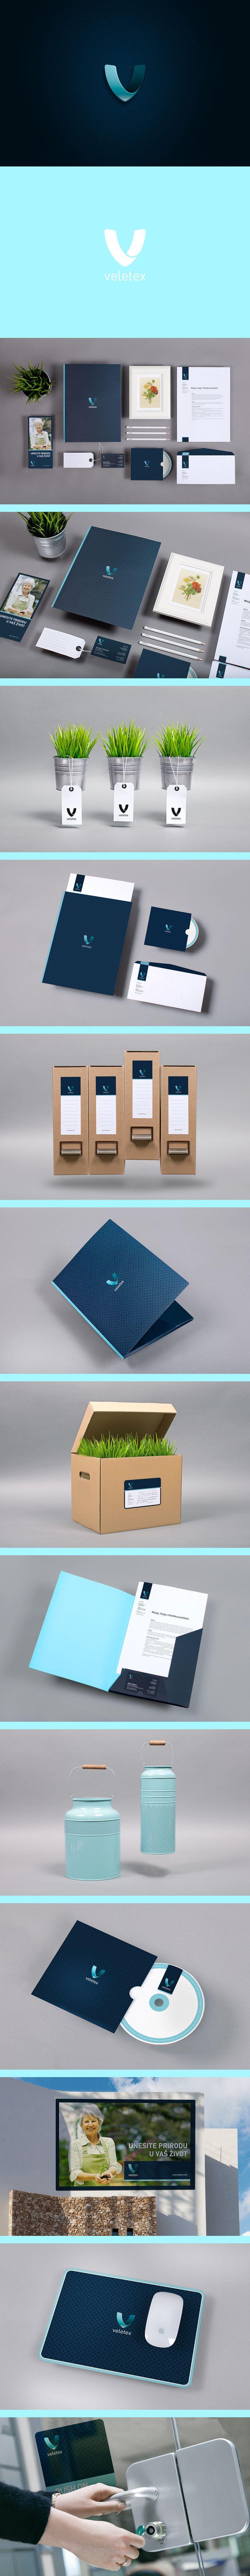 veletex | #stationary #corporate #design #corporatedesign #logo #identity…